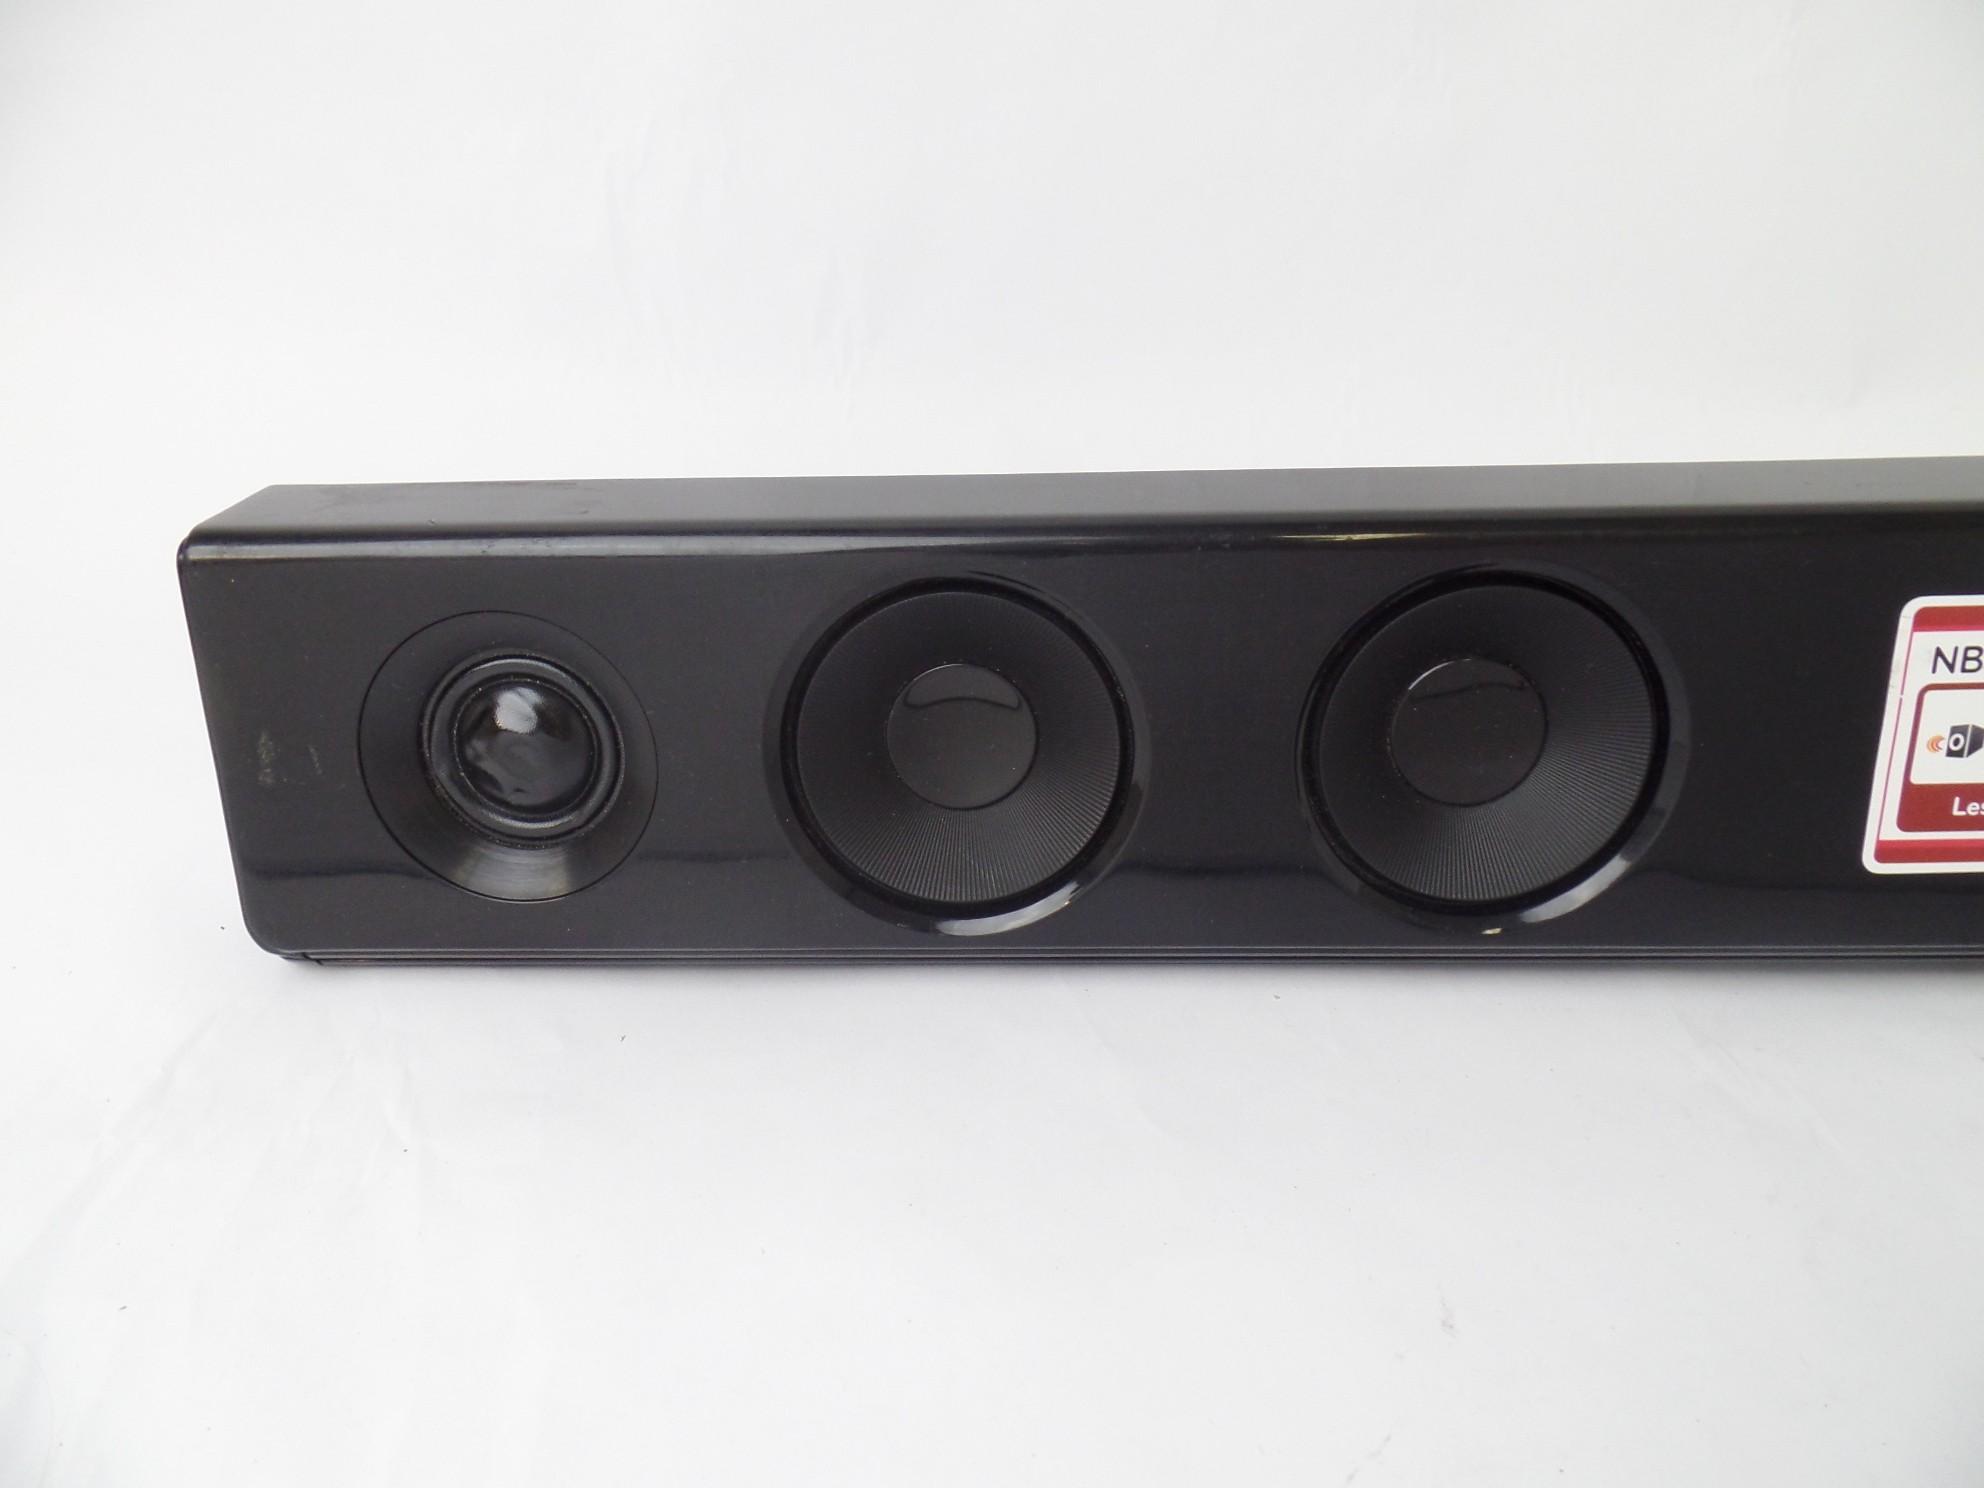 LG Soundbar NB3530A USB Bluetooth